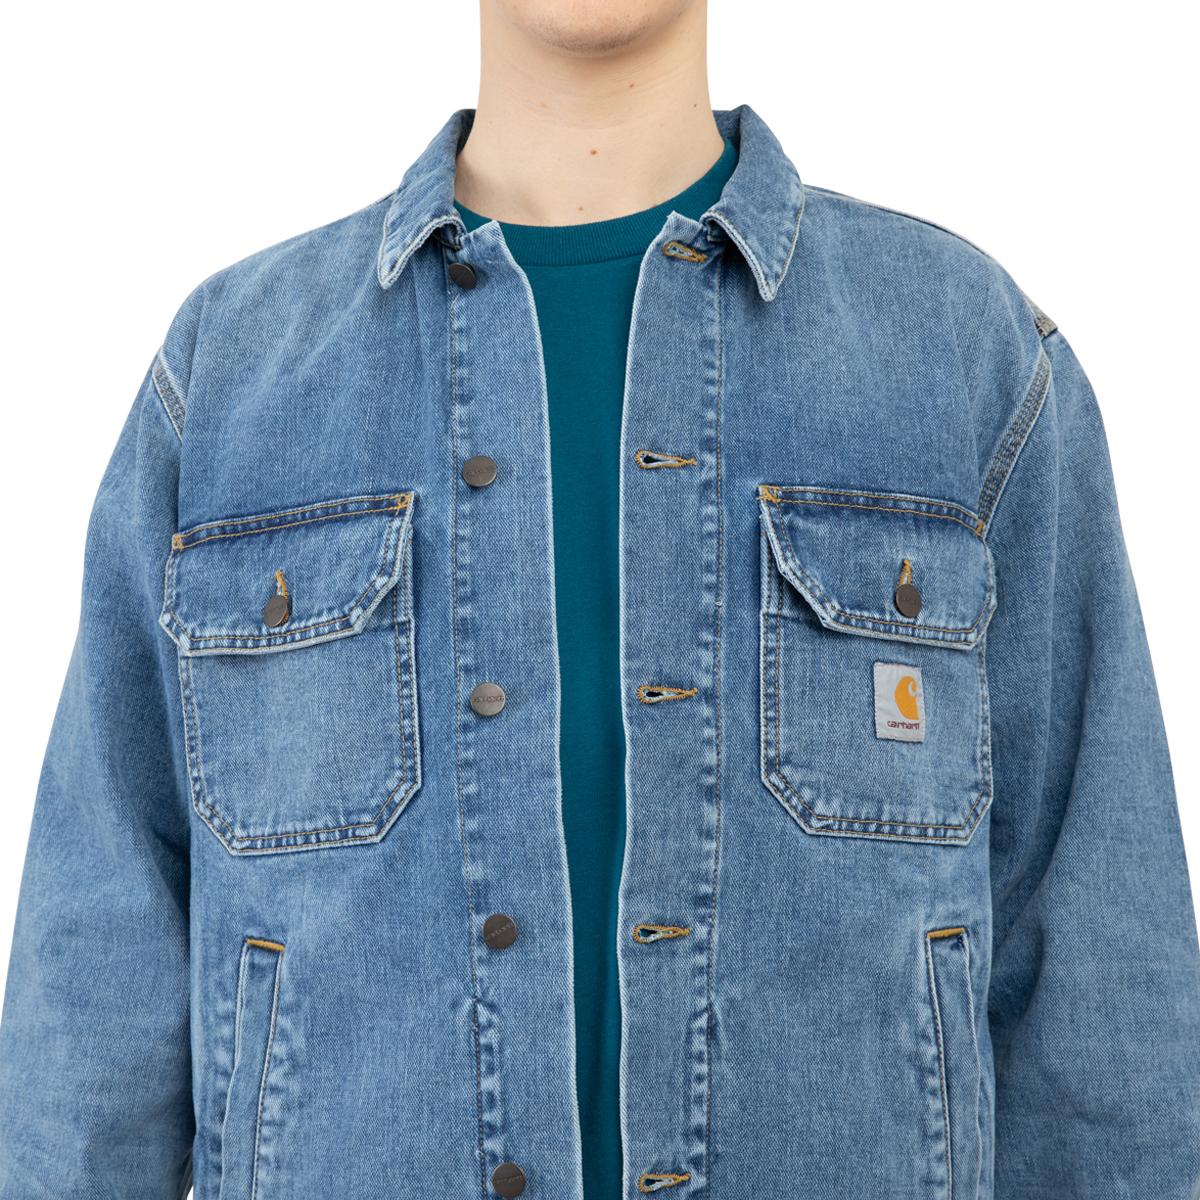 Carhartt WIP Stetson Jacket